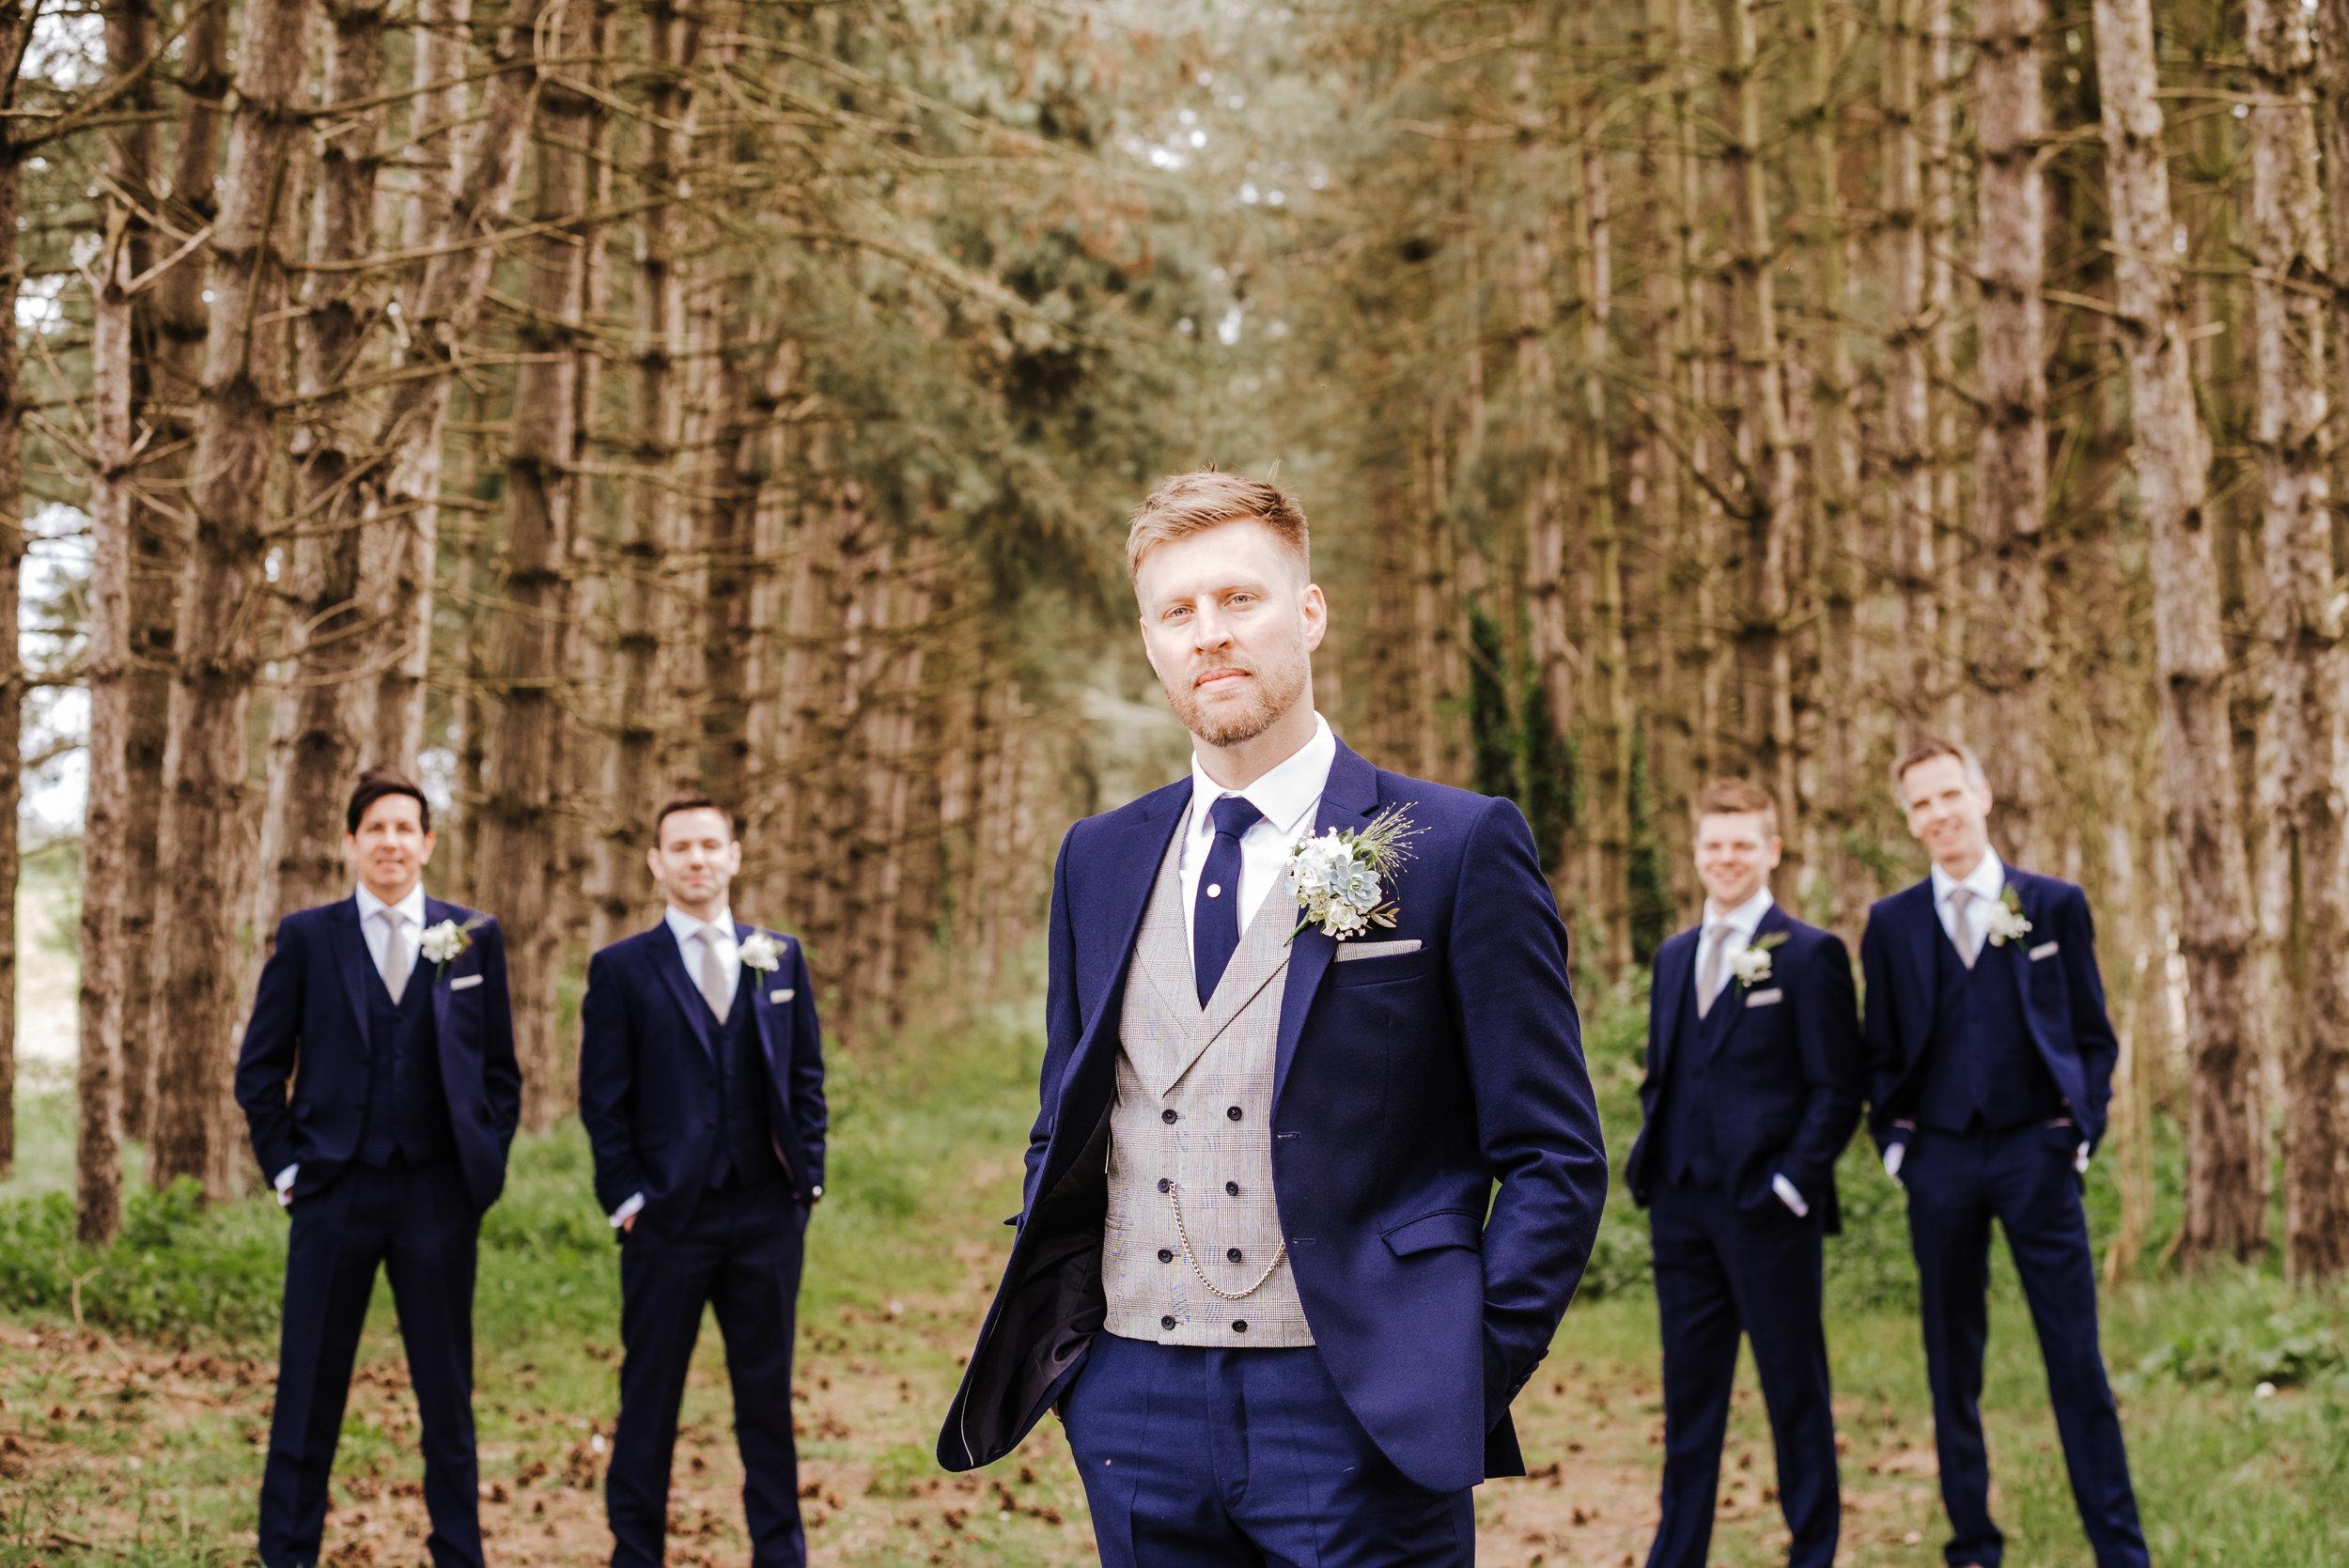 essex-norfolk-suffolk-wedding-photographer-faulty-manor2.JPG